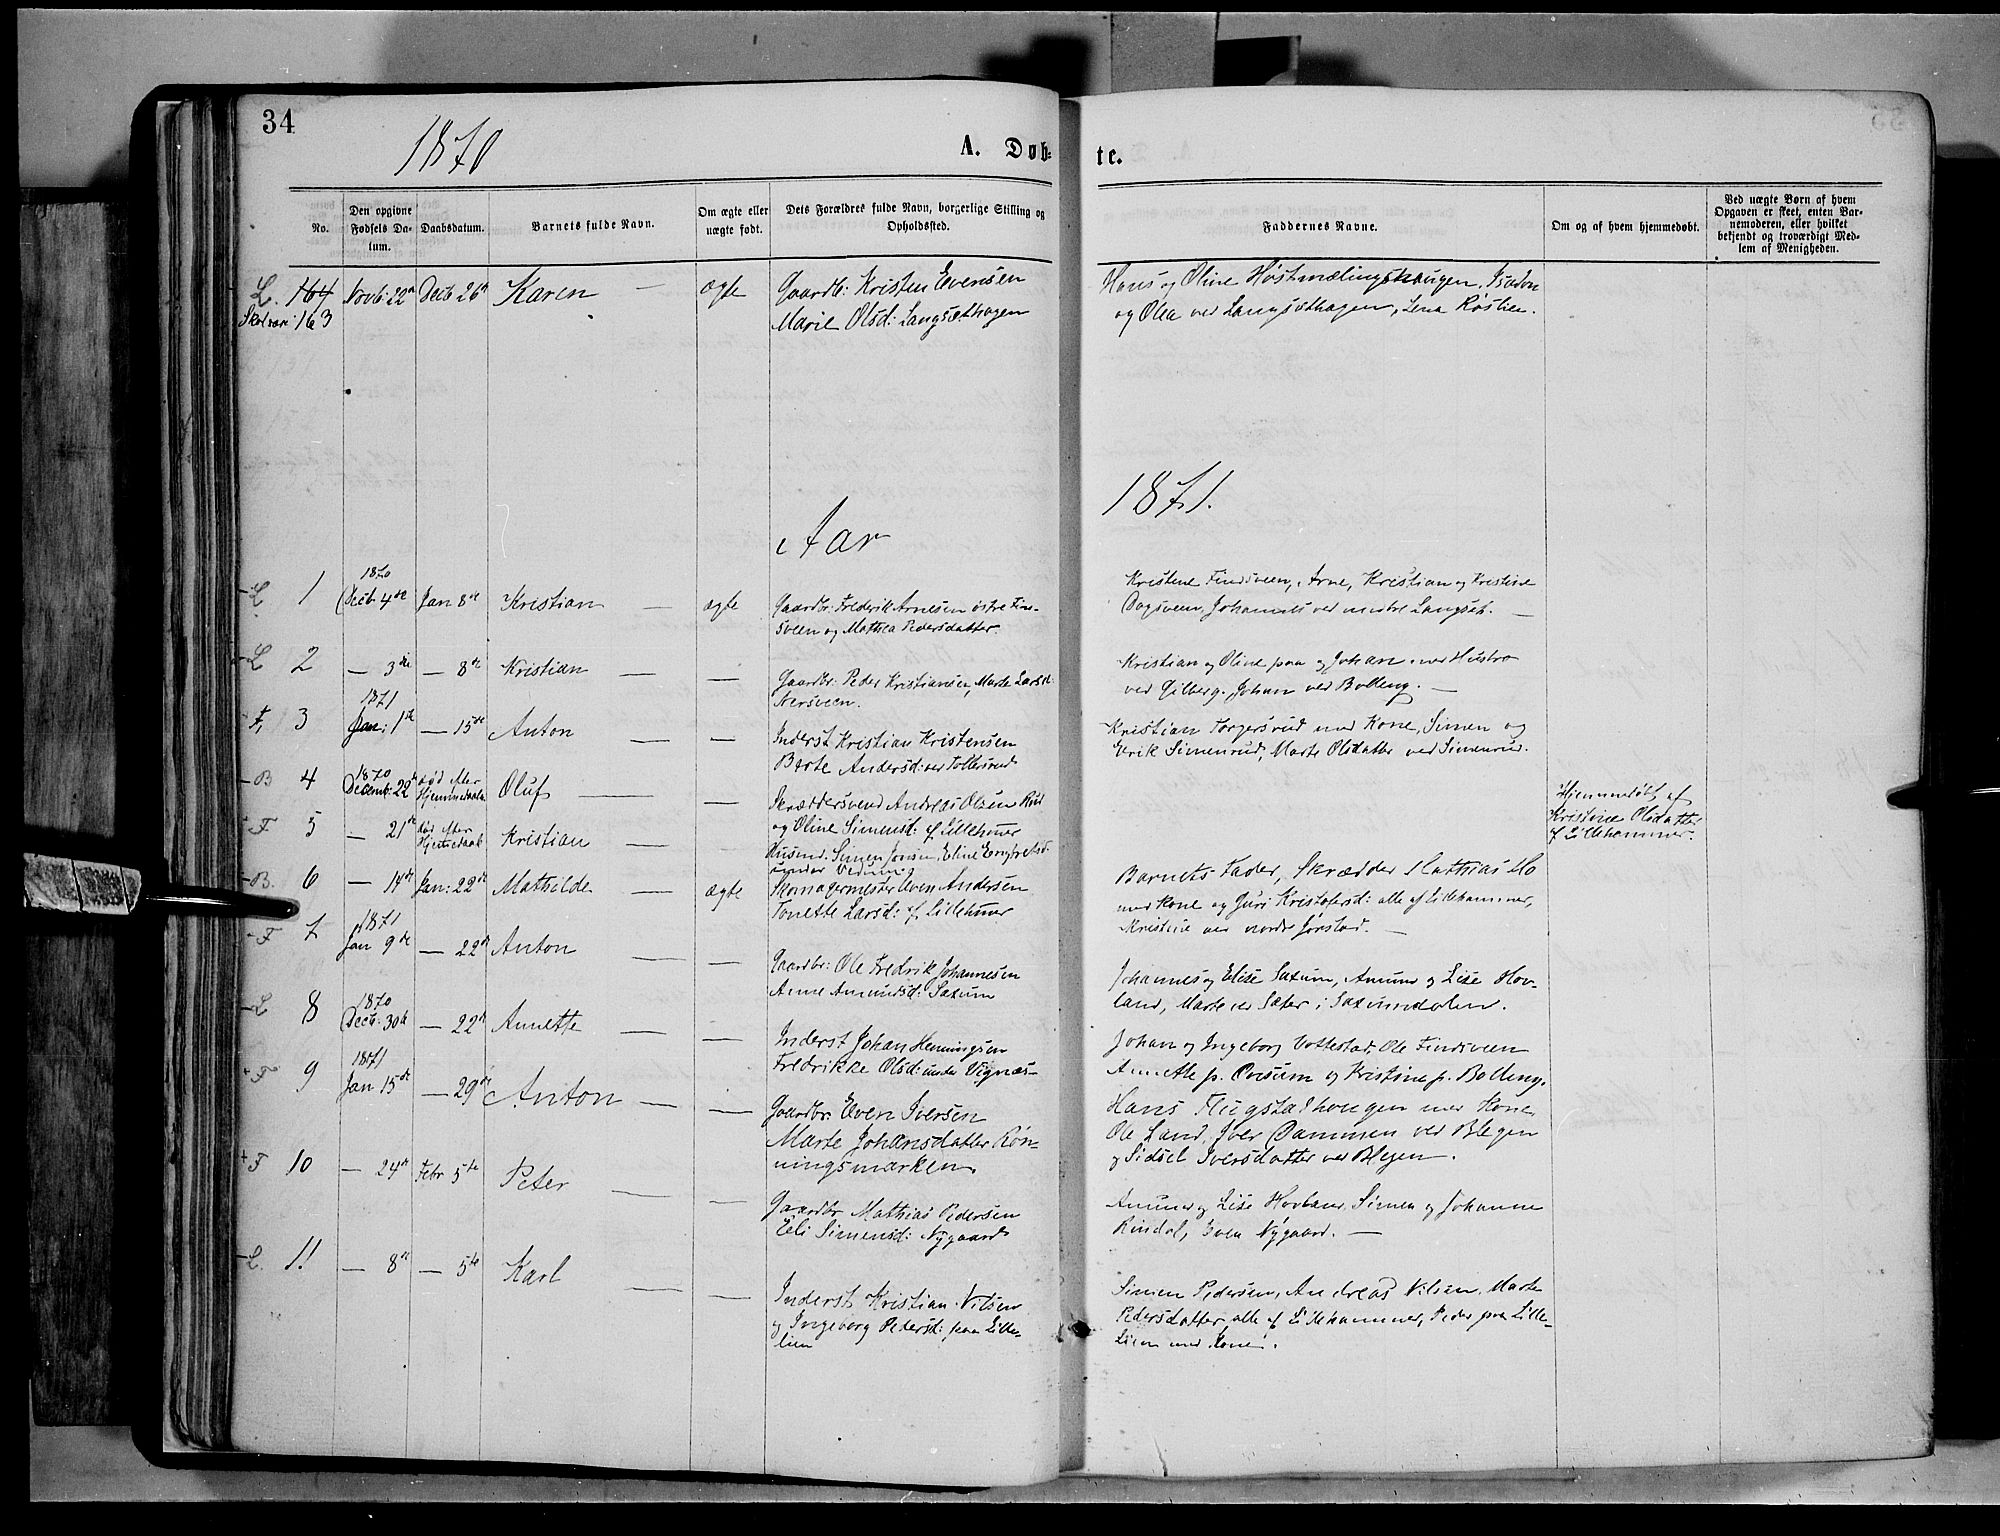 SAH, Fåberg prestekontor, Ministerialbok nr. 7, 1868-1878, s. 34